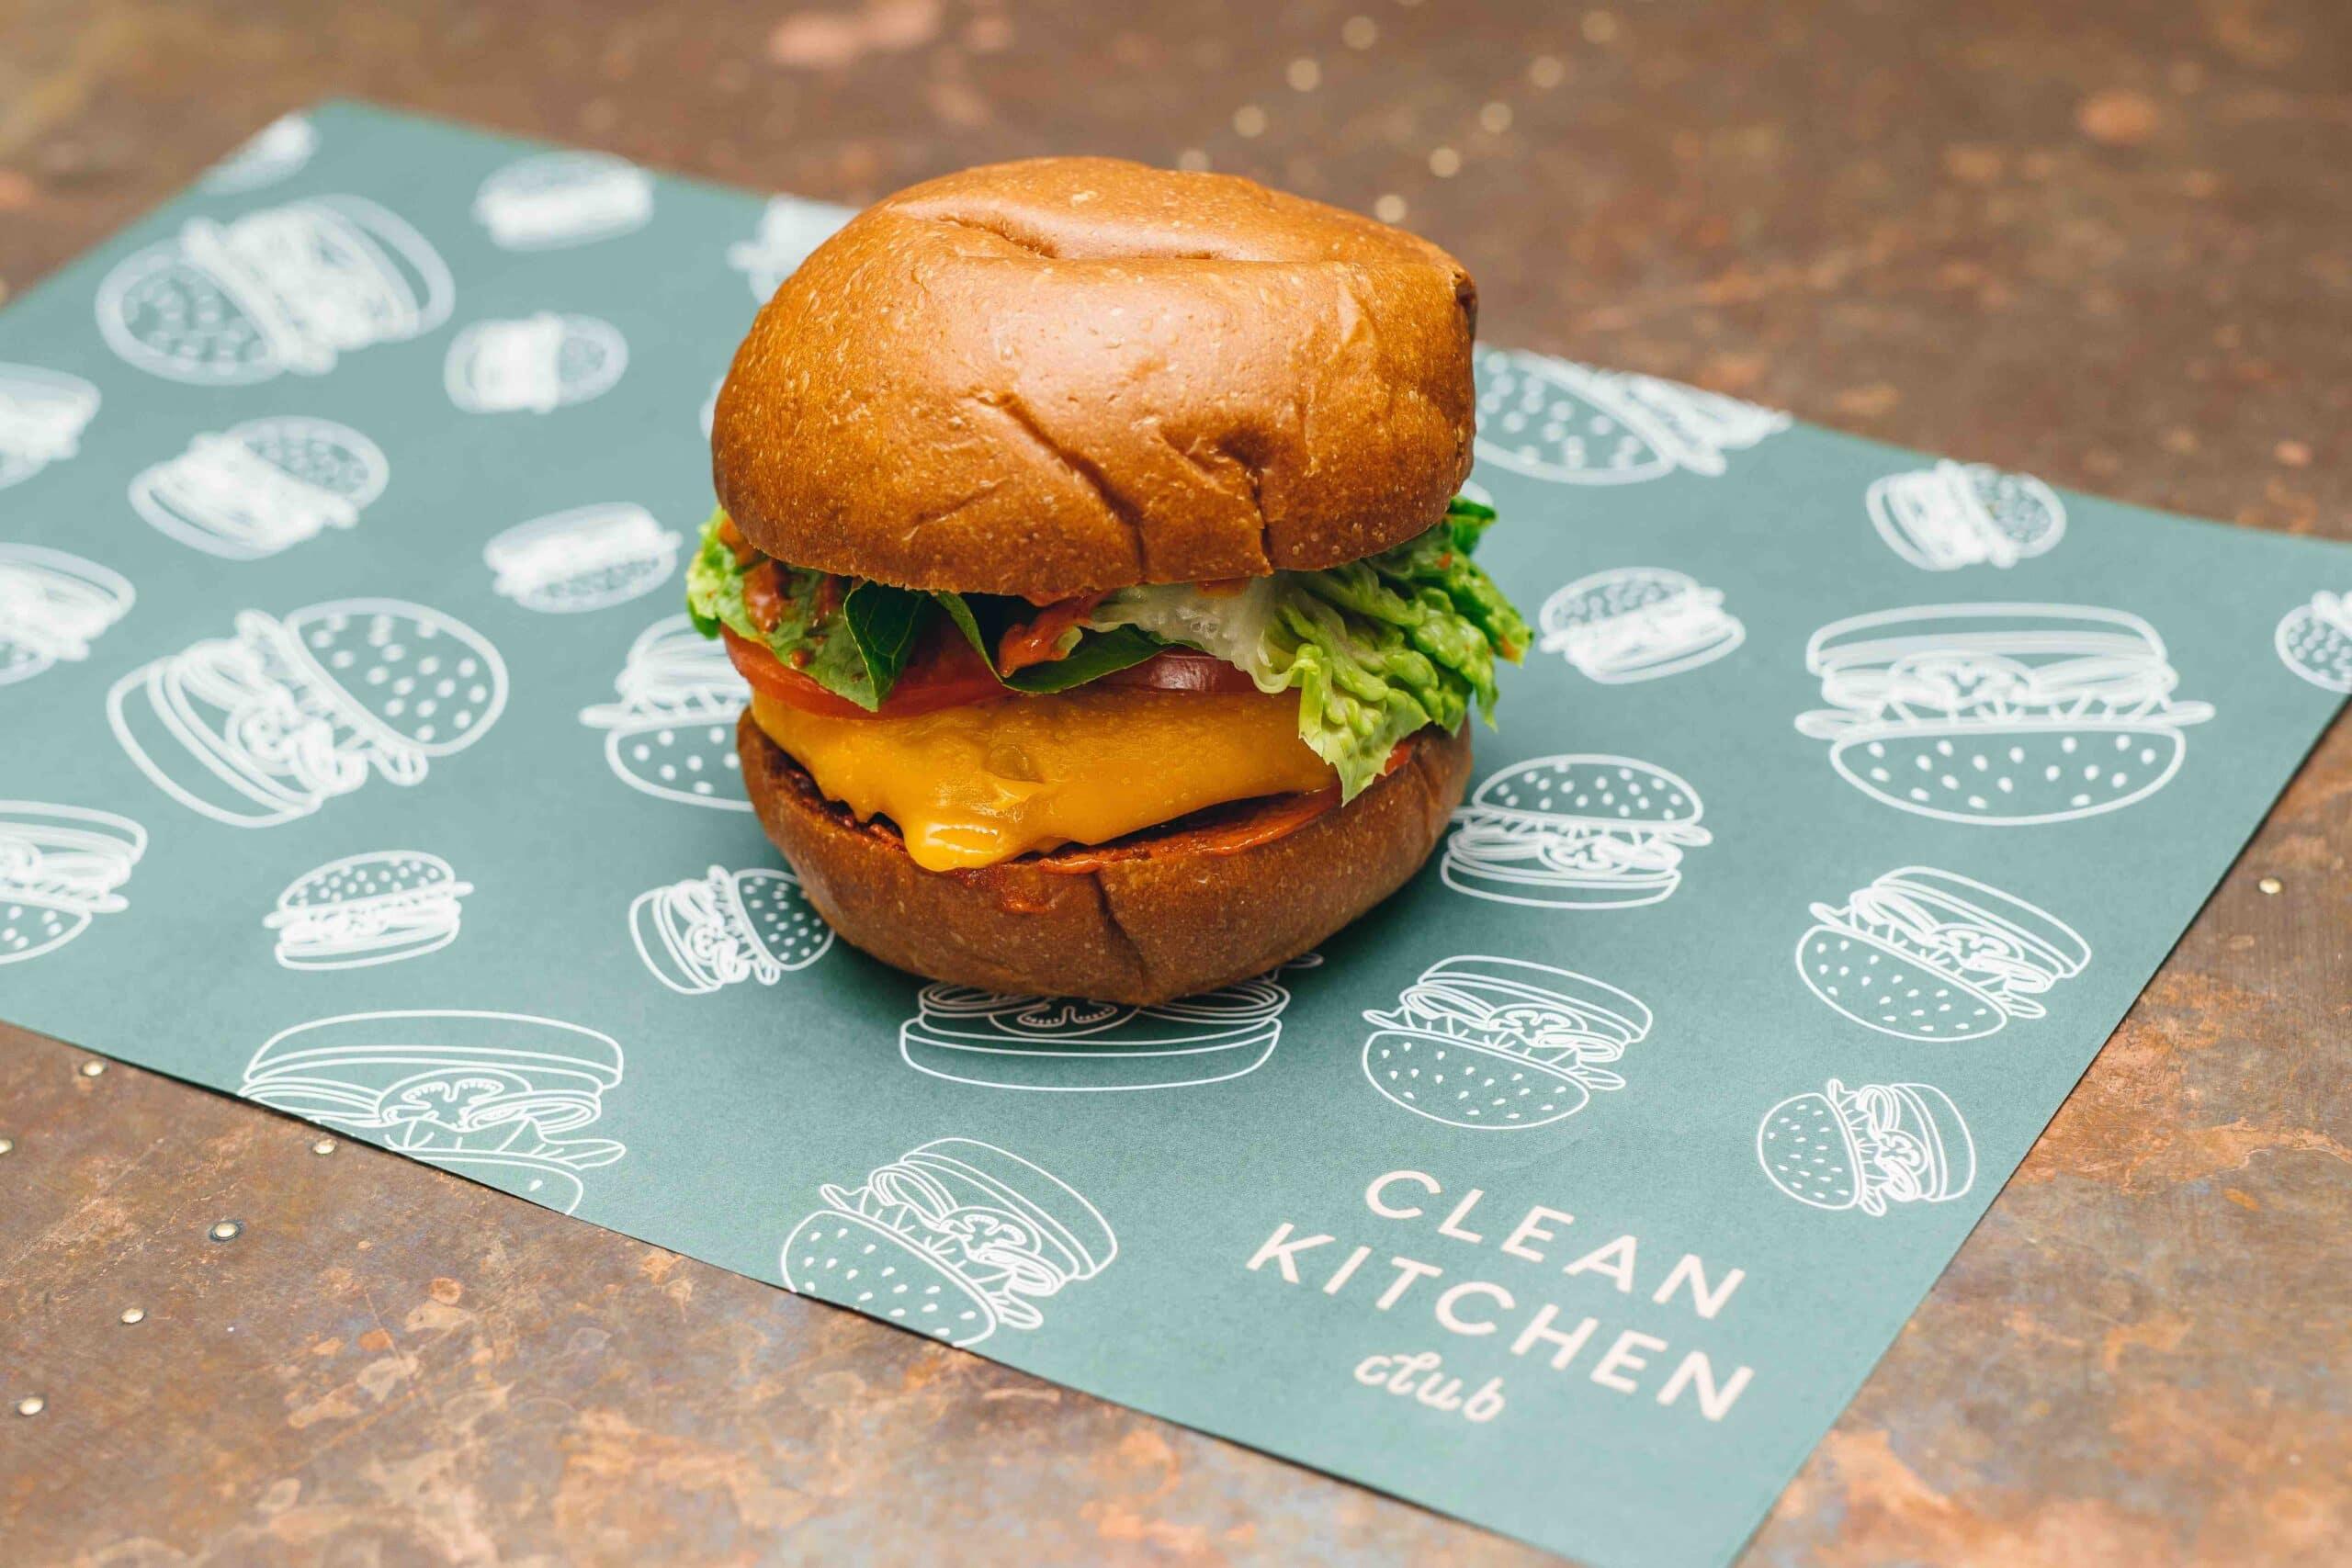 CLEAN KITCHEN National Burger Day